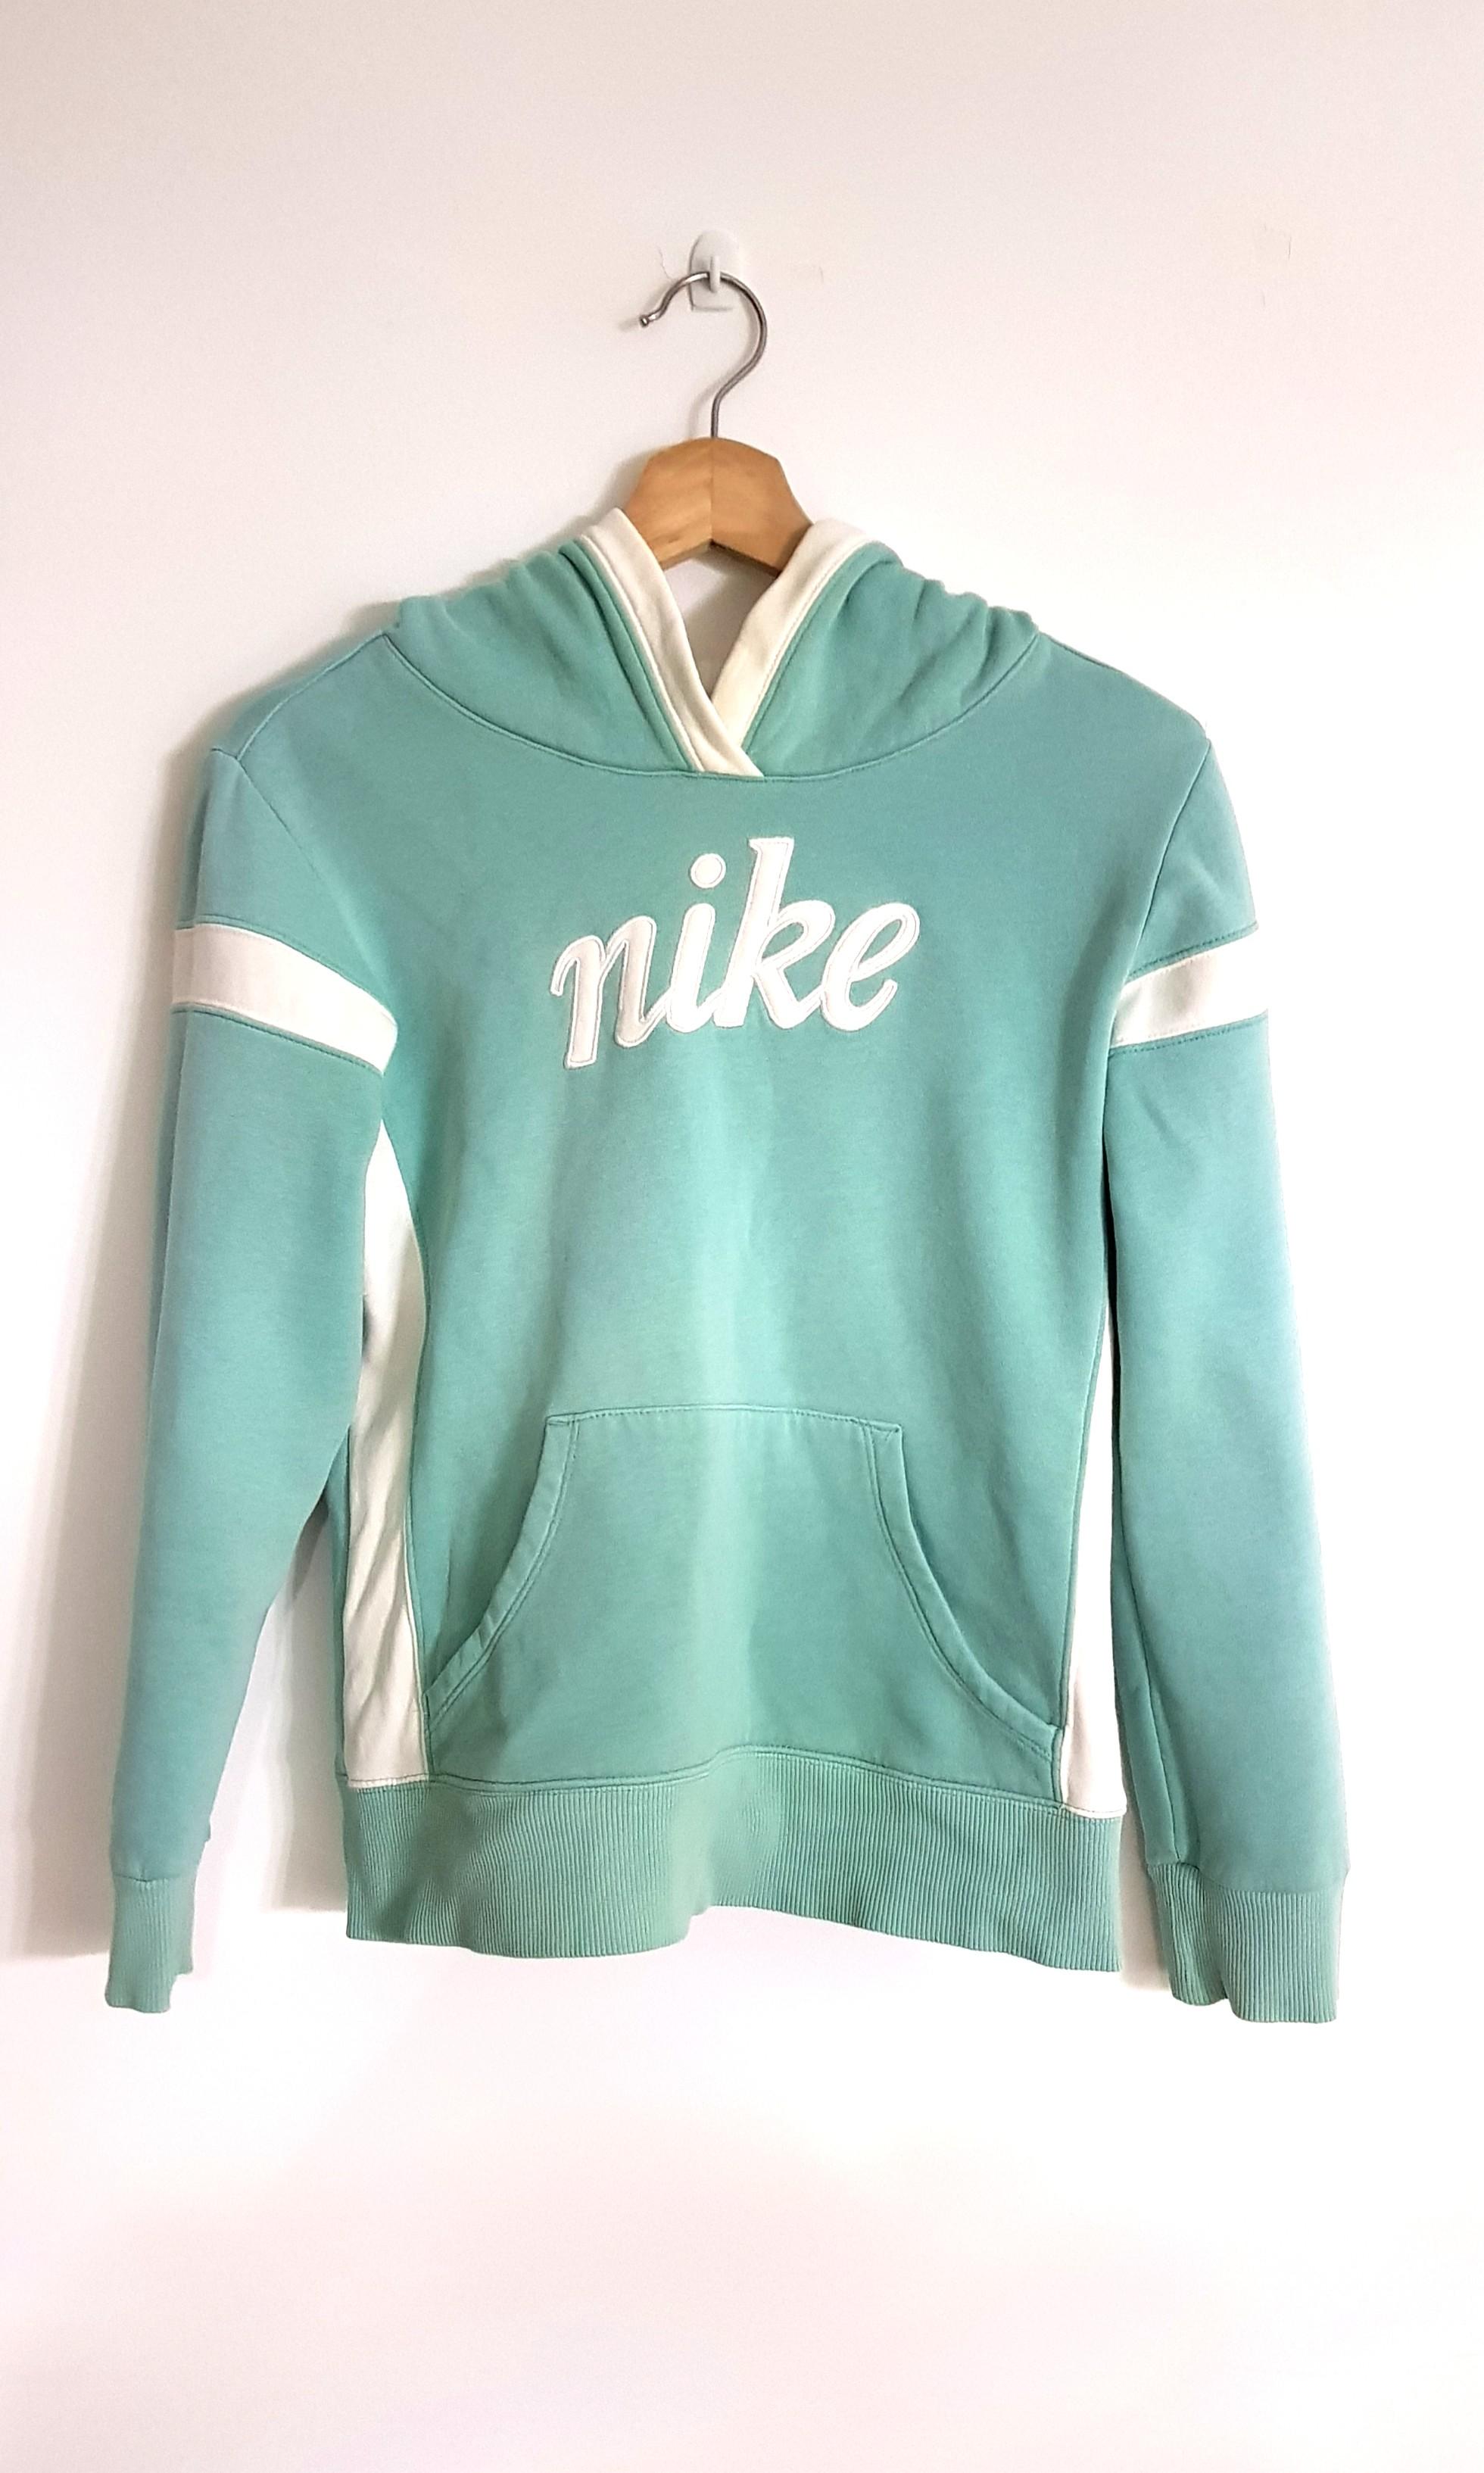 Vintage Fashion On Hoodie Women's Nike Tops Clothes Sweatshirt CzAwp